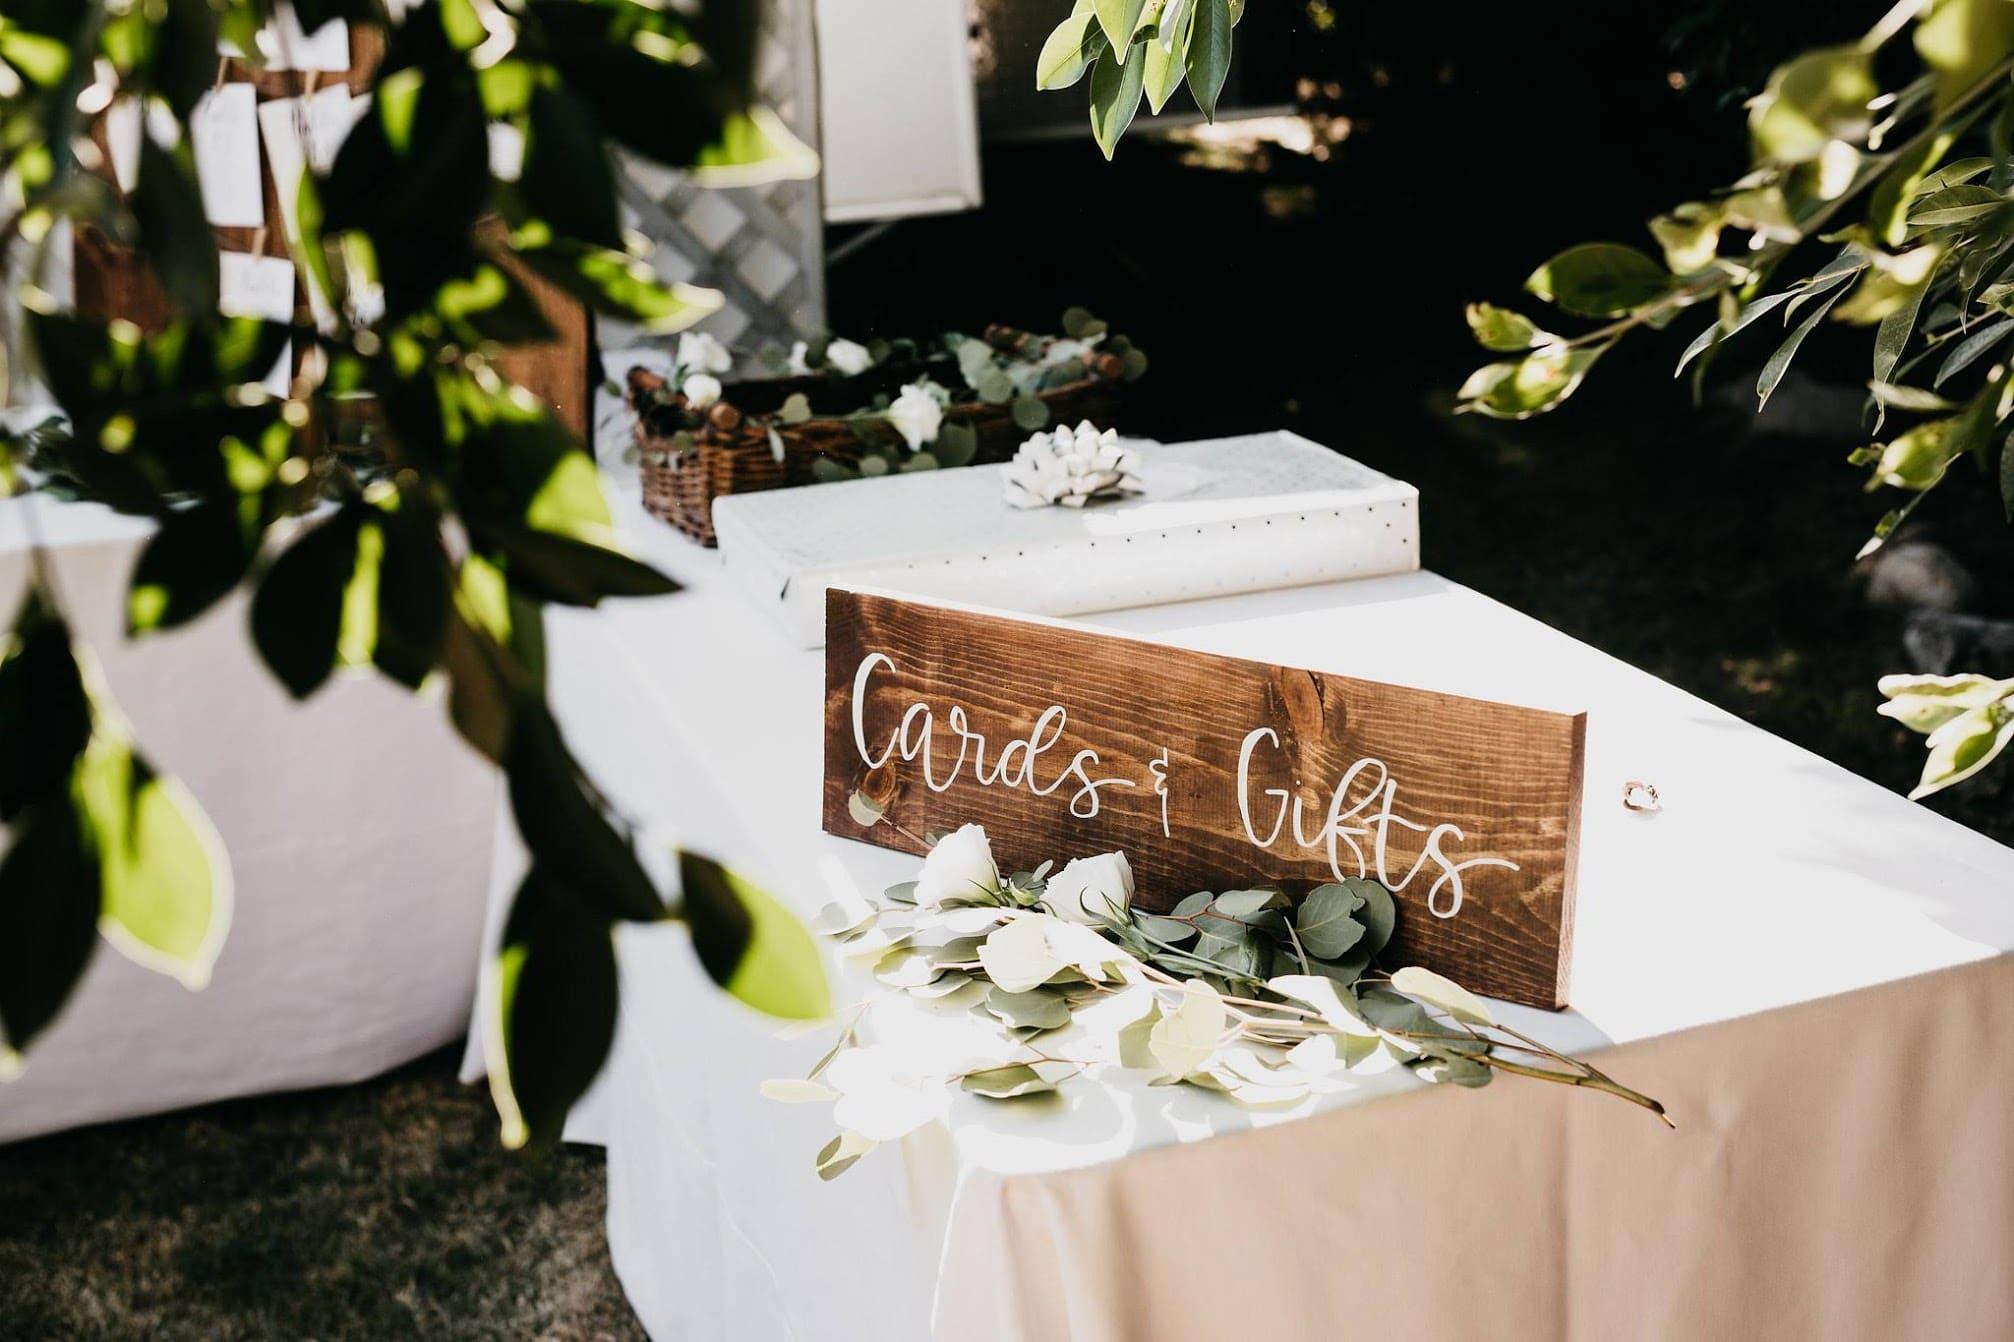 McCartneyBlake_Ceremony3 catering san diego wedding catering